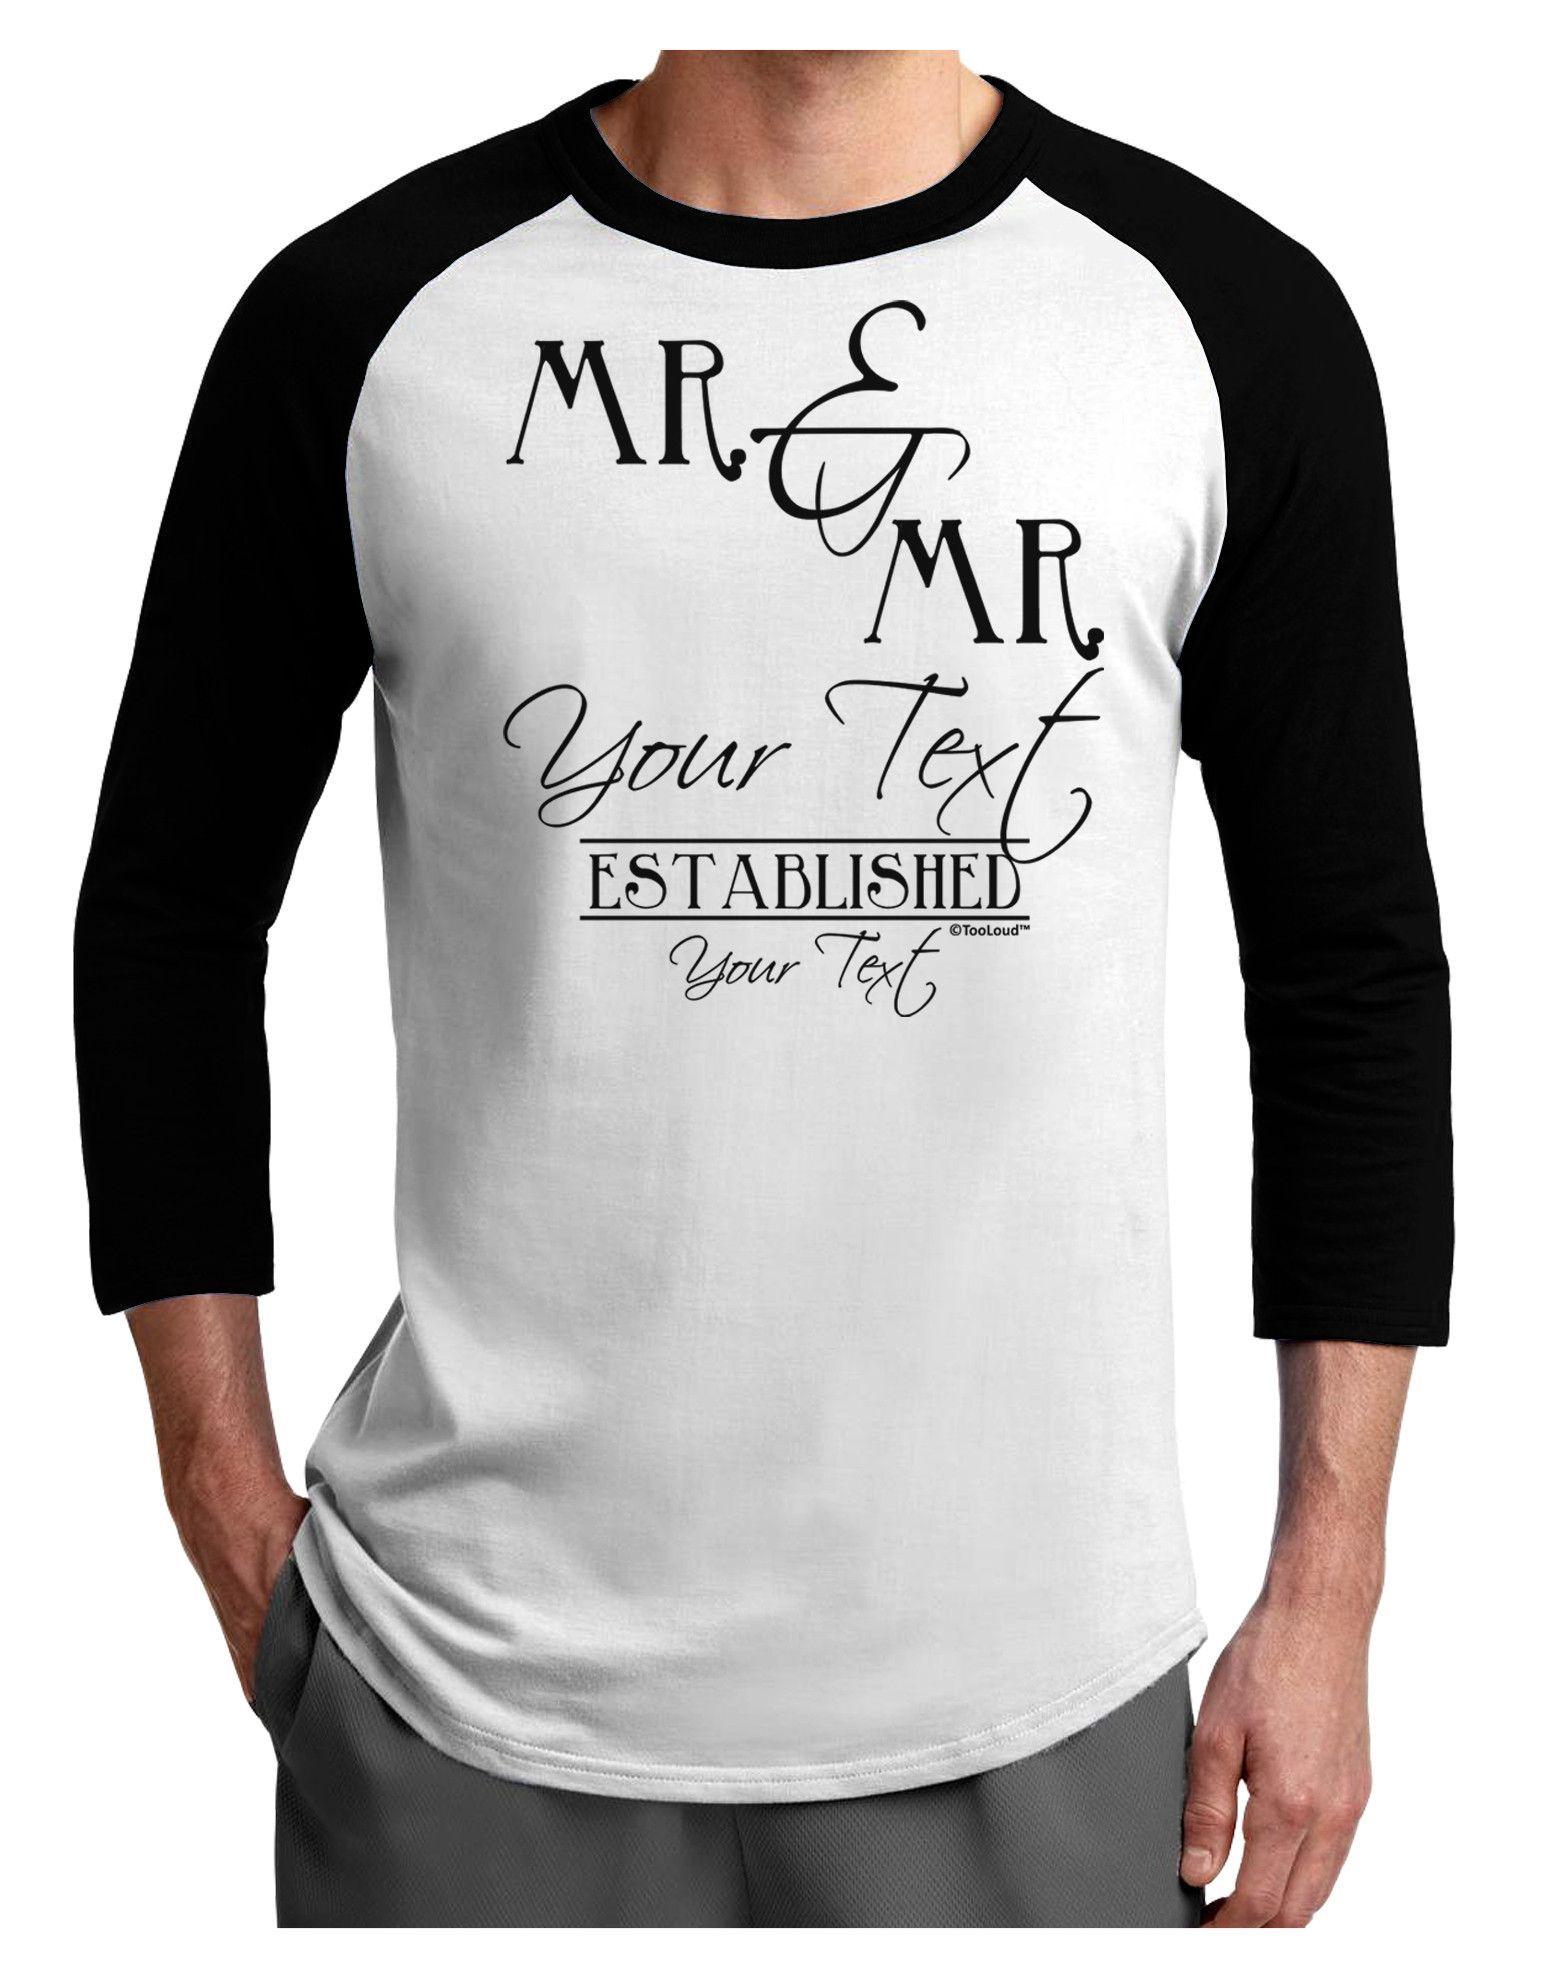 TooLoud Personalized Mr and Mr -Name- Established -Date- Design Adult Raglan Shirt